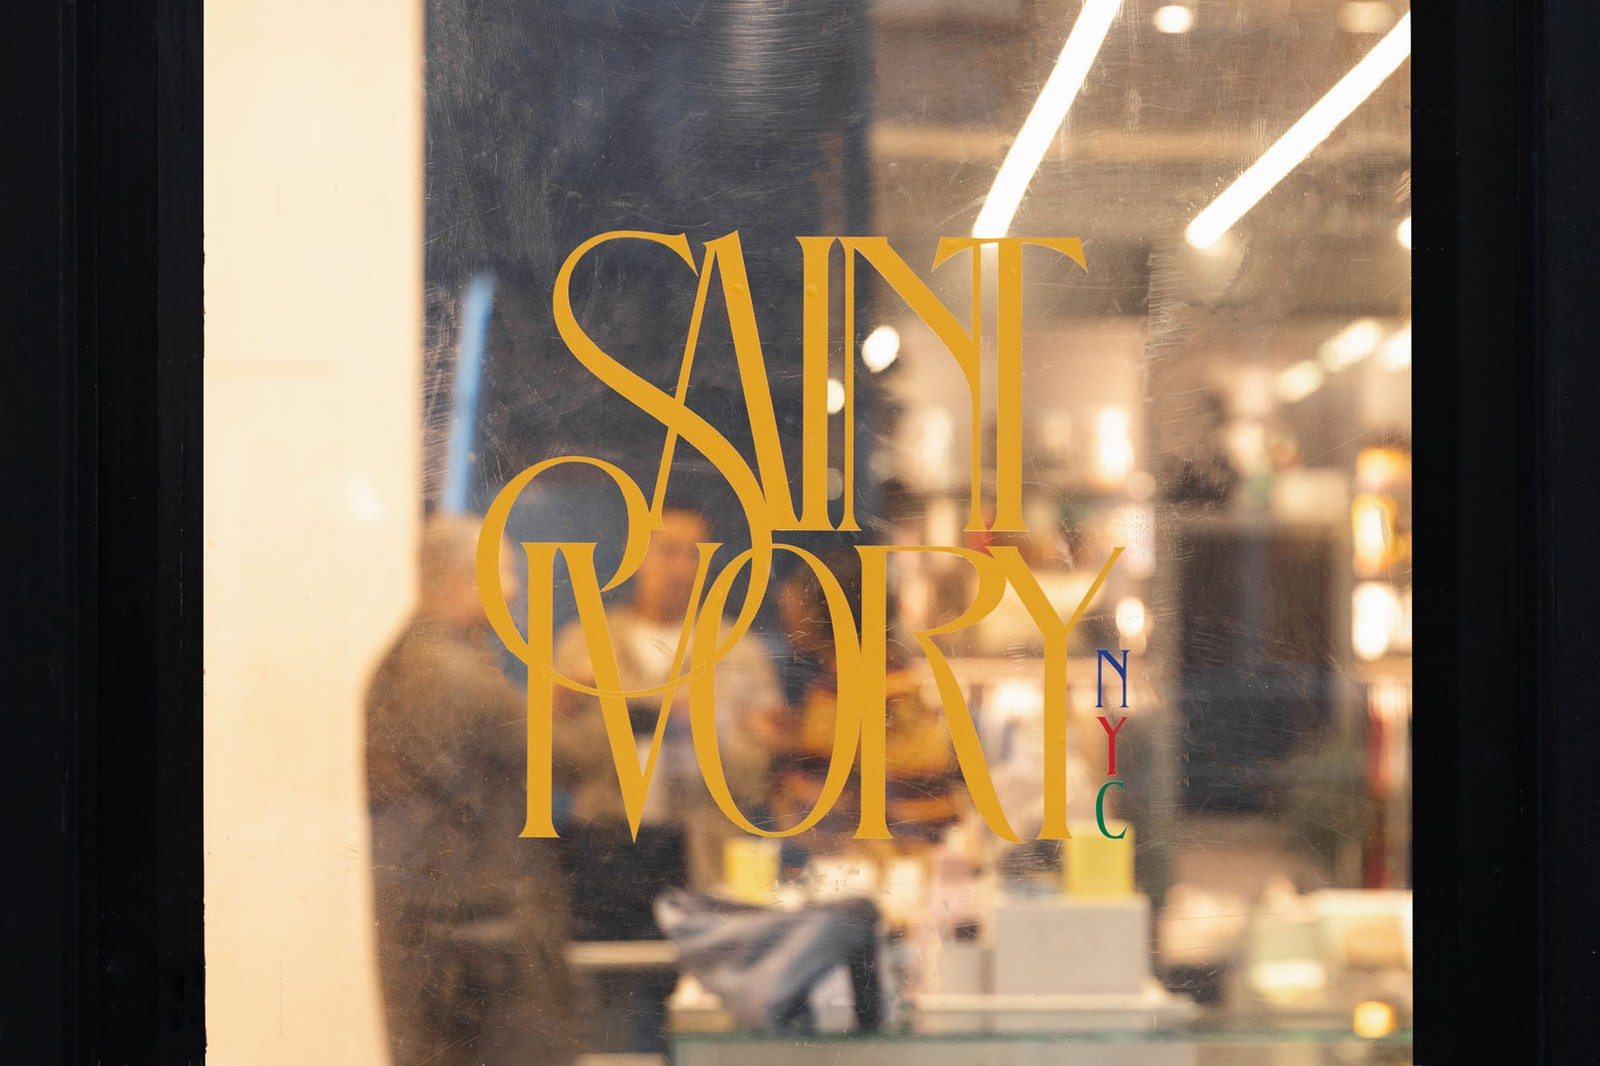 Saint Ivory NYC Semester 1 Collection Script Logo Sweater